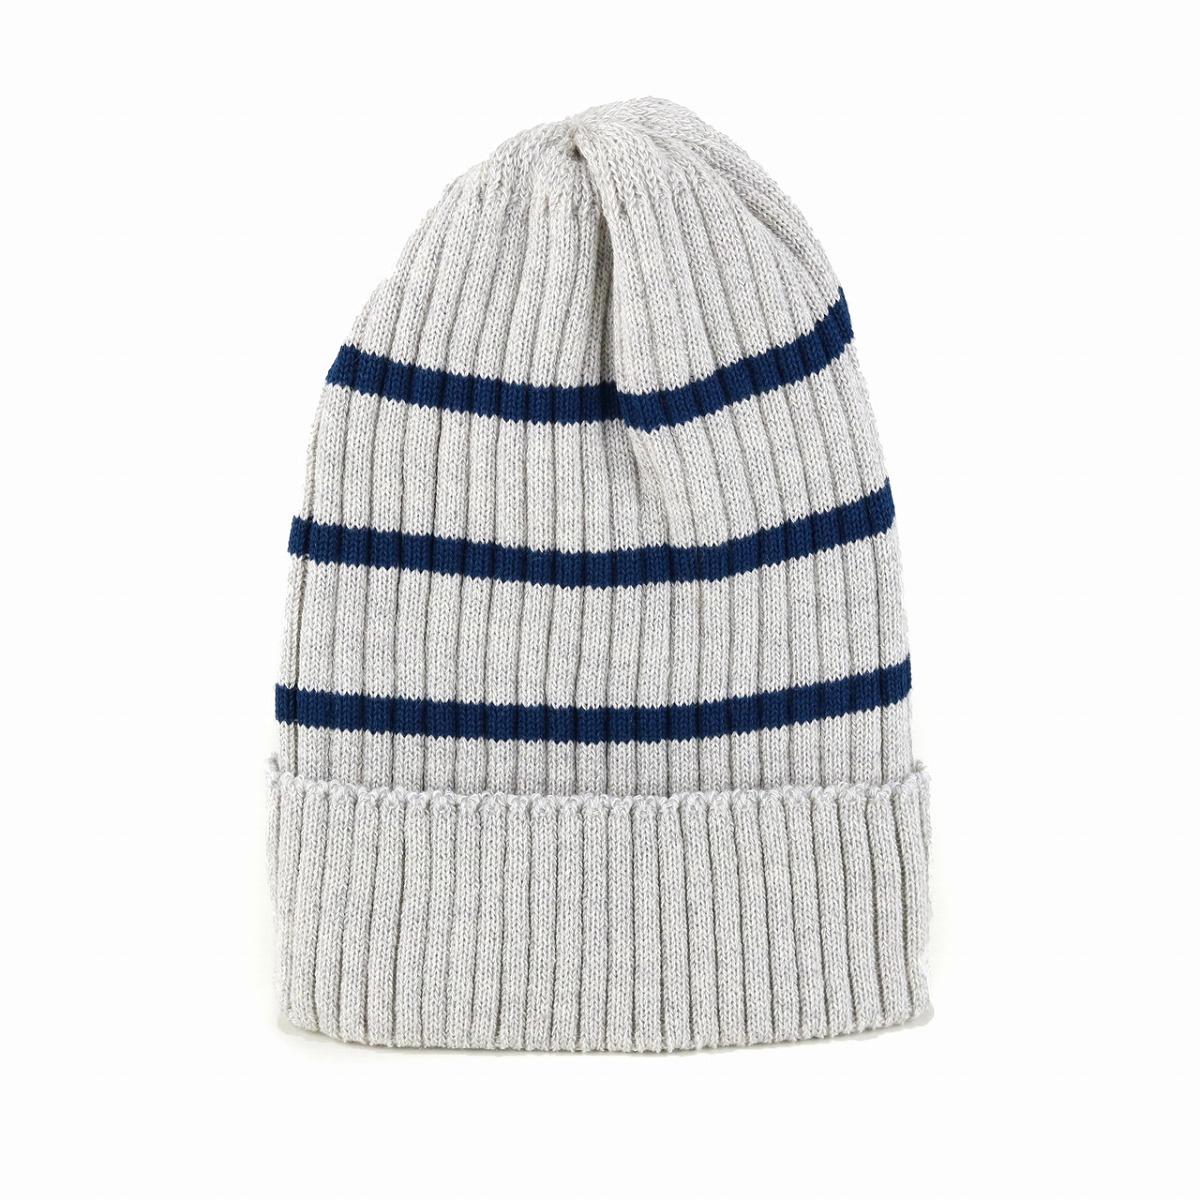 3f312355537 ELEHELM HAT STORE  Adjustable size unisex   light gray  beanie cap ...